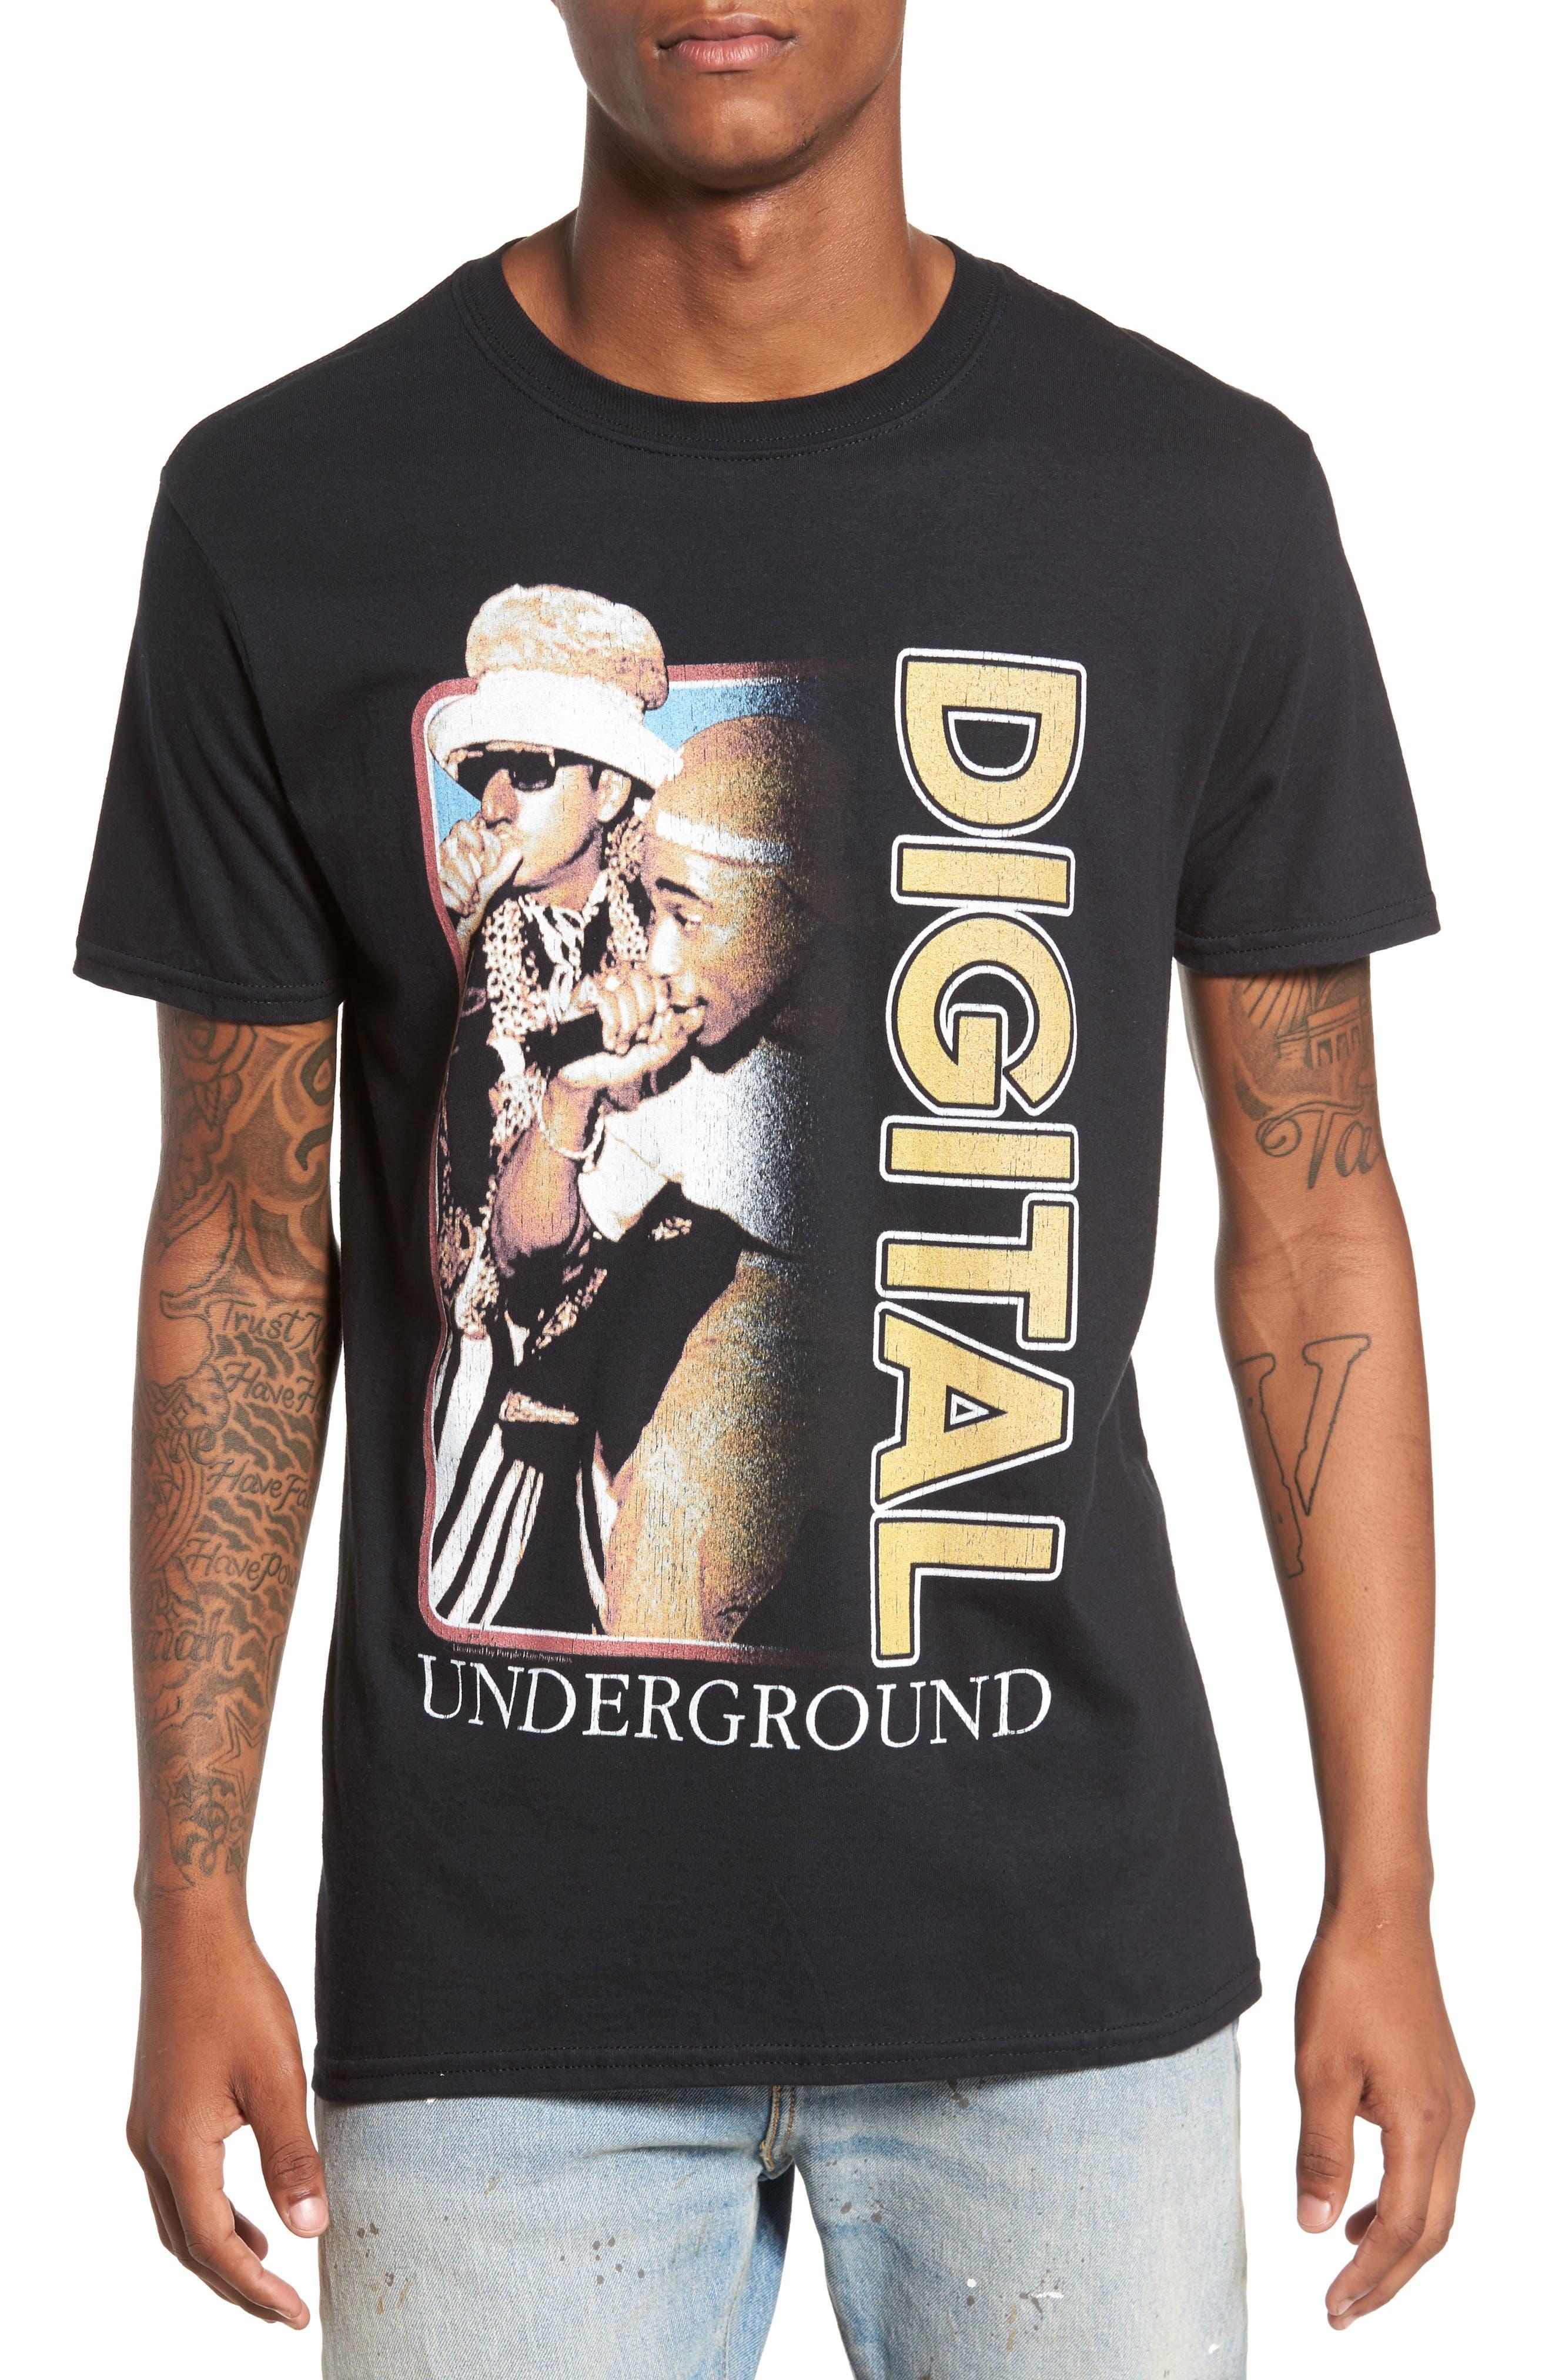 Main Image - The Rail Digital Underground T-Shirt